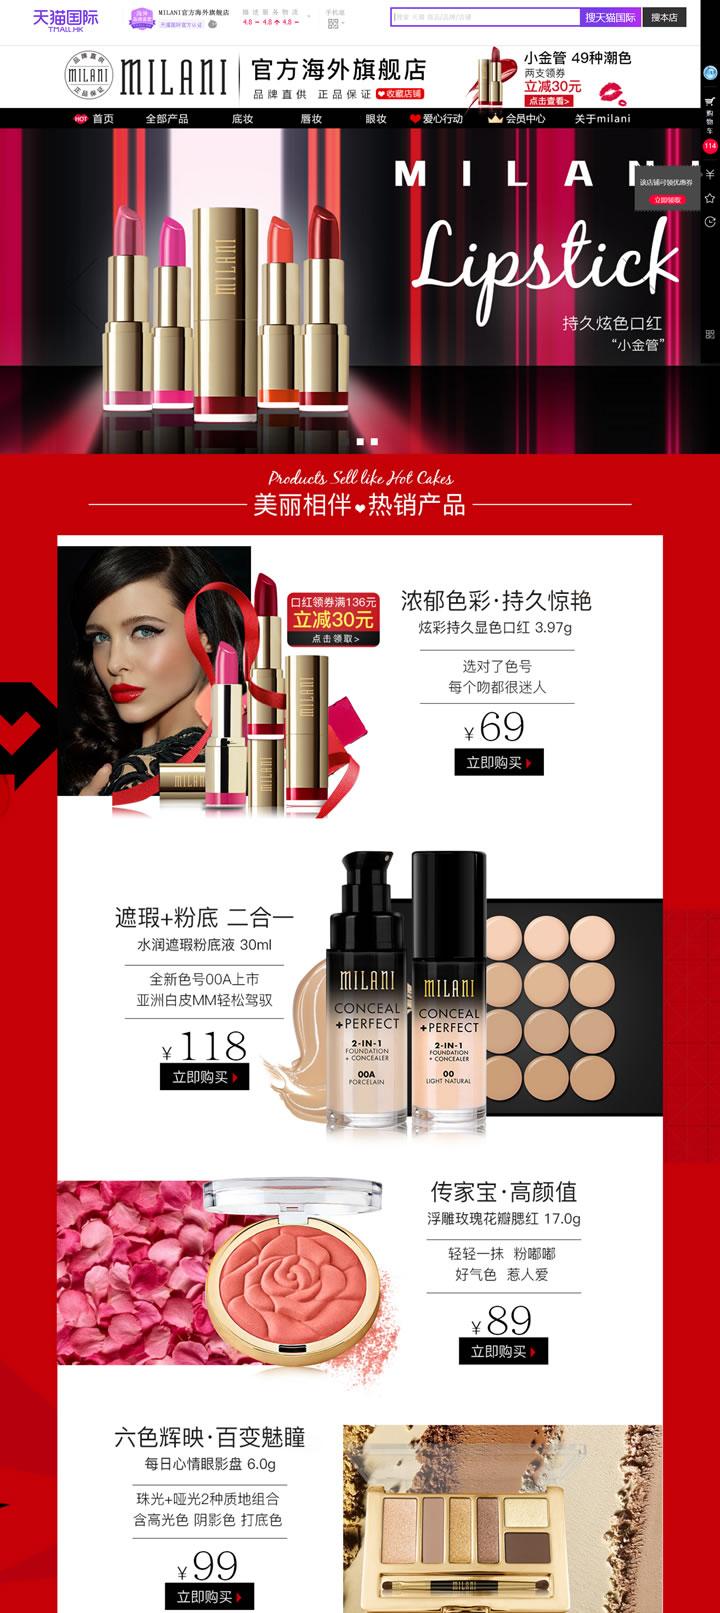 MILANI官方海外旗舰店:美国超人气彩妆品牌,平价MAC